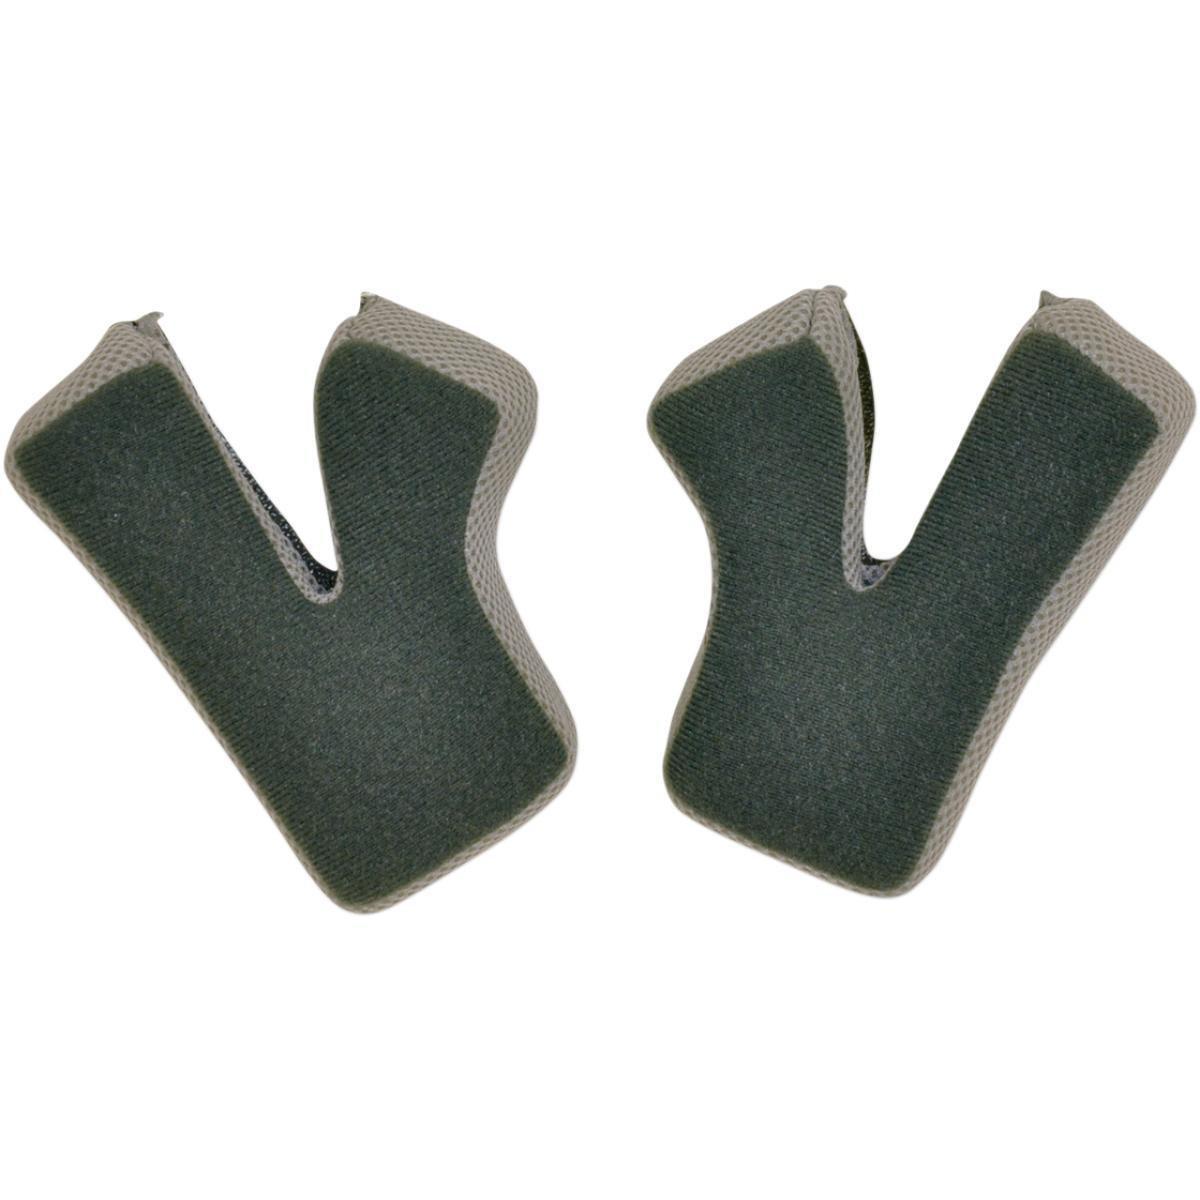 AFX Helmet Cheek Pads for FX-17 - Multi - Md